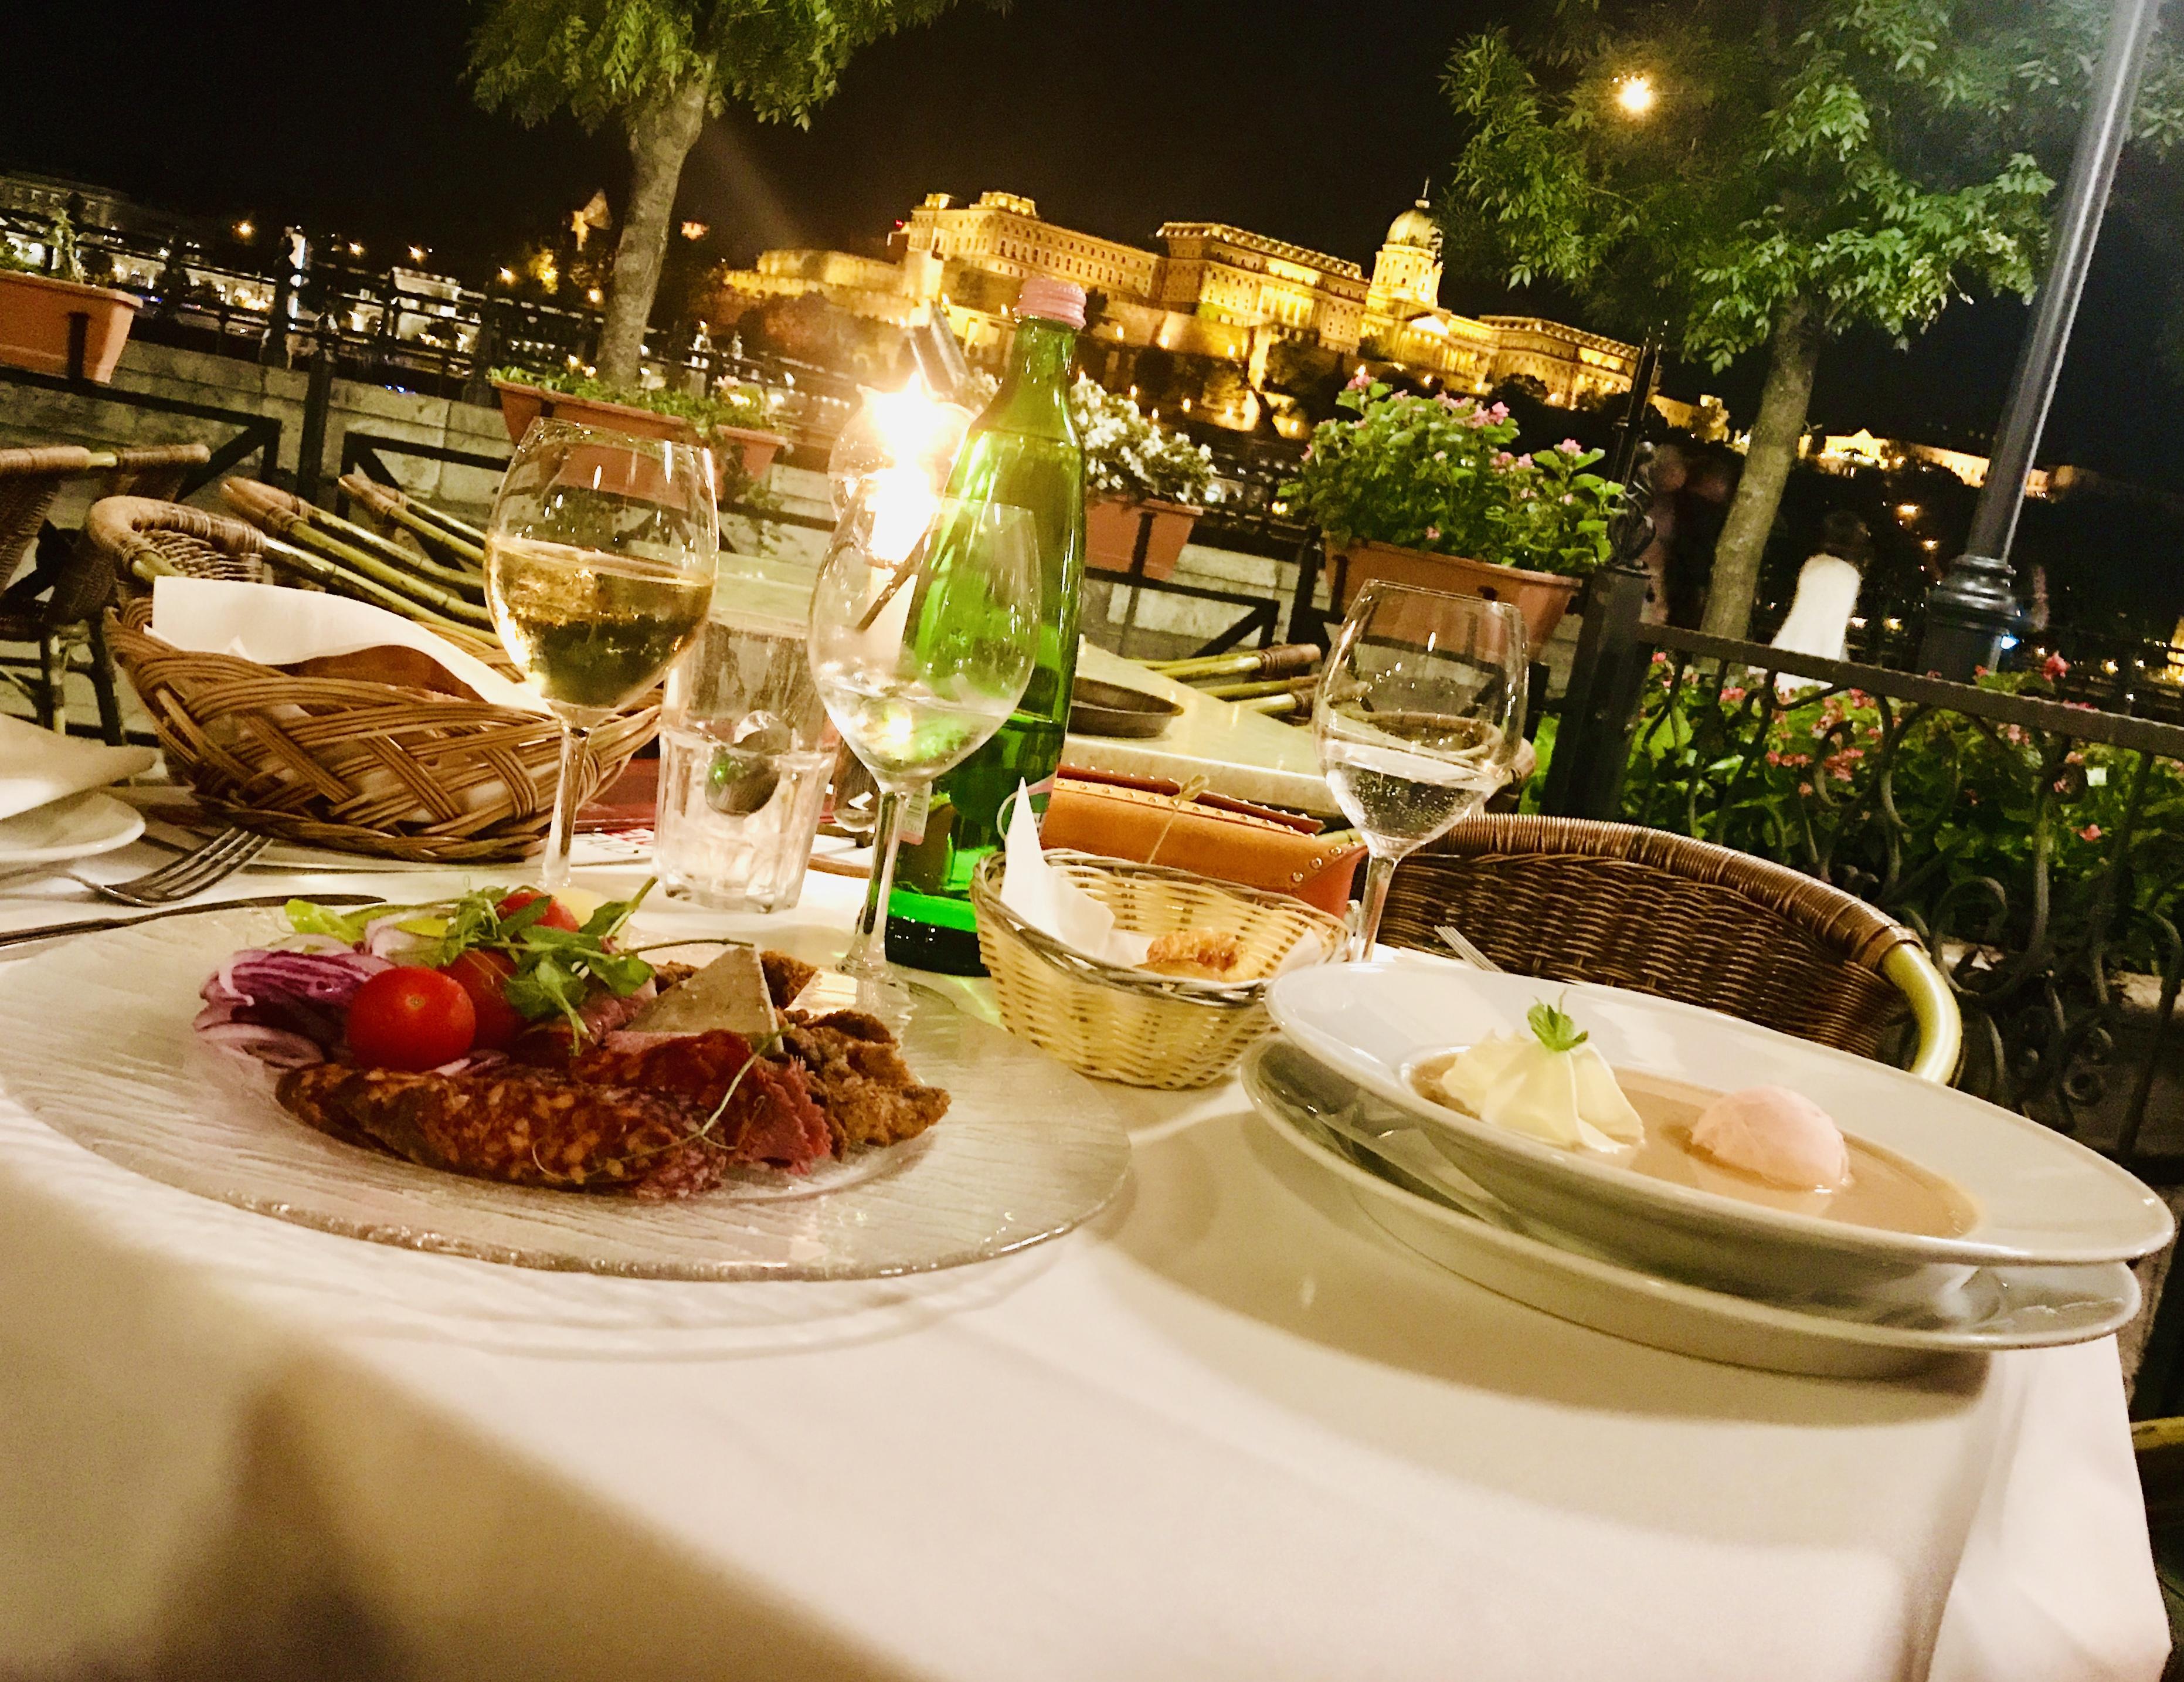 dunacorso-budapest-restaurant-lustforthesublime